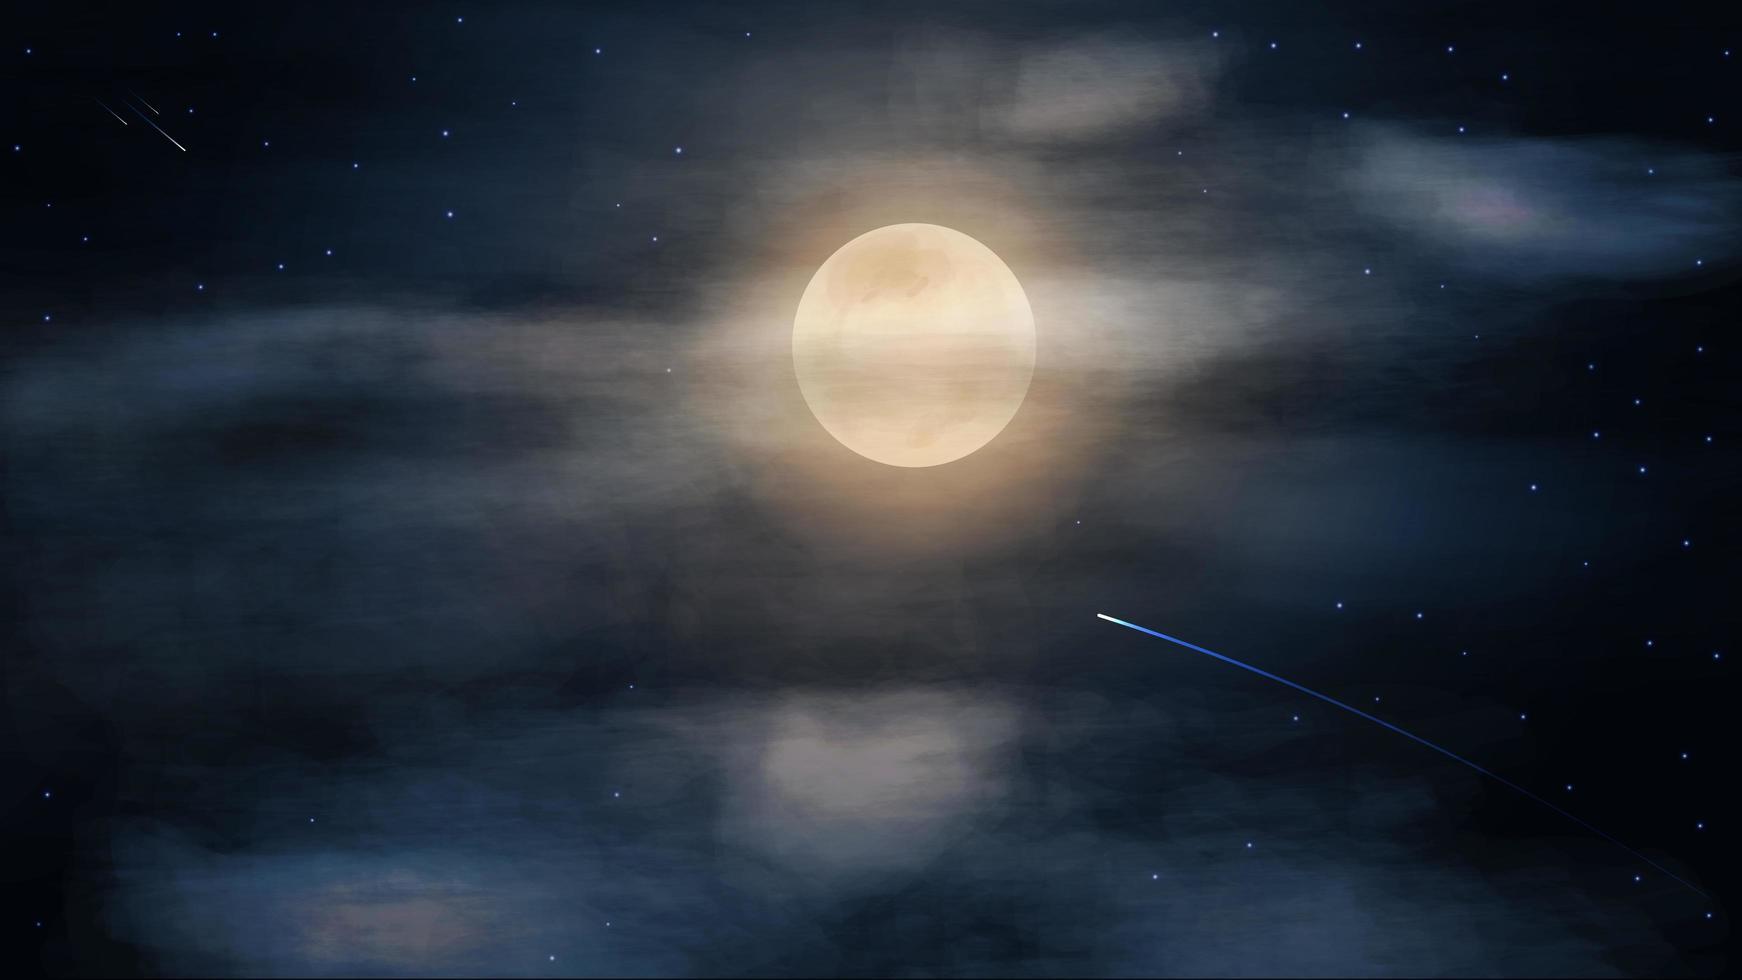 blå stjärnklar natthimmel med stor fullmåne i moln vektor